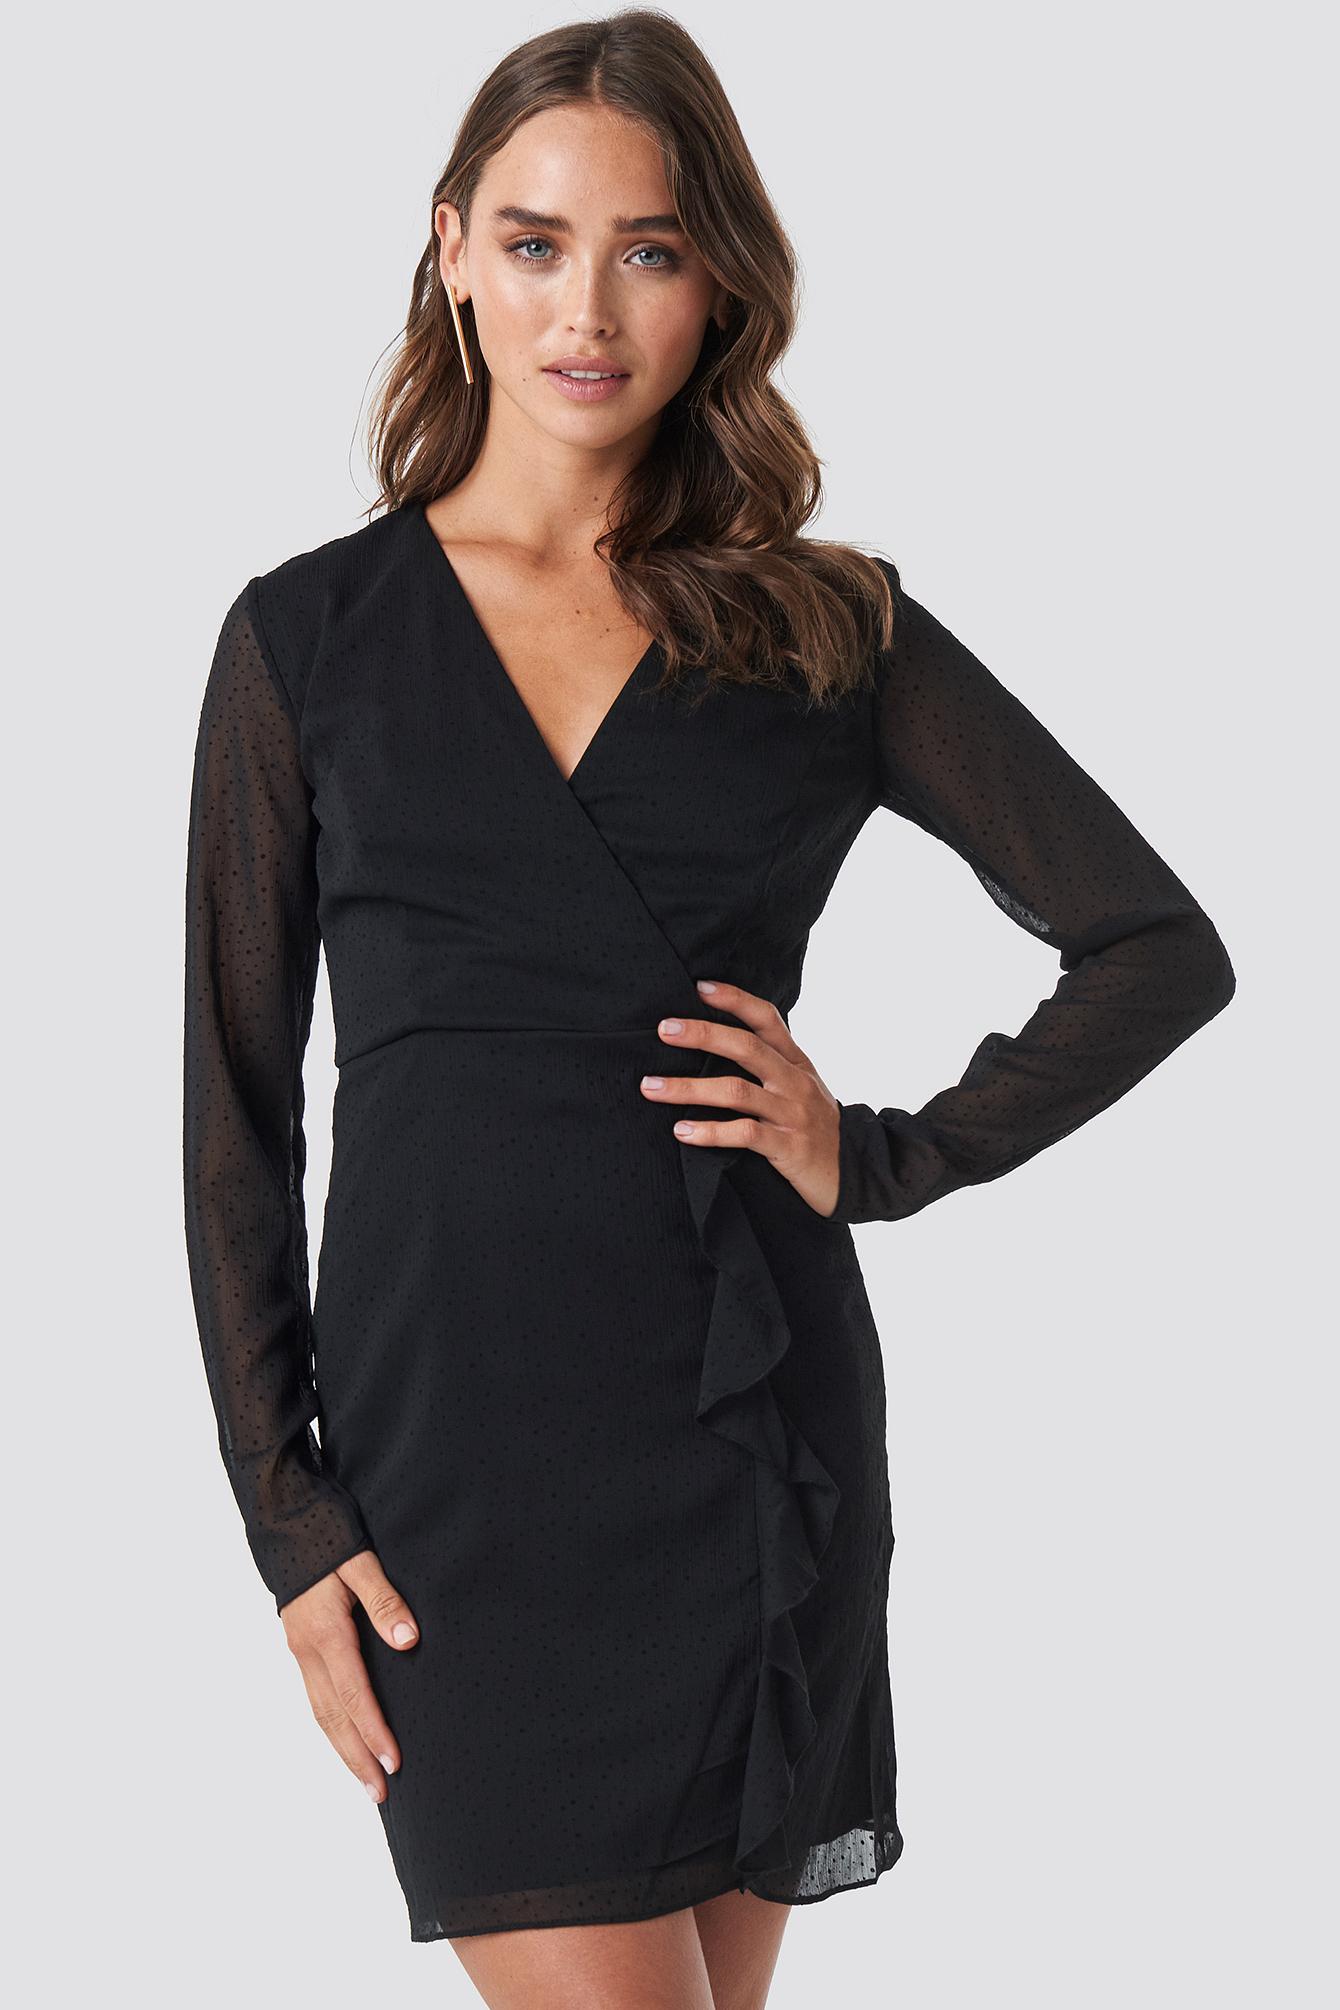 Mesh Sleeve Frilly Dress NA-KD.COM